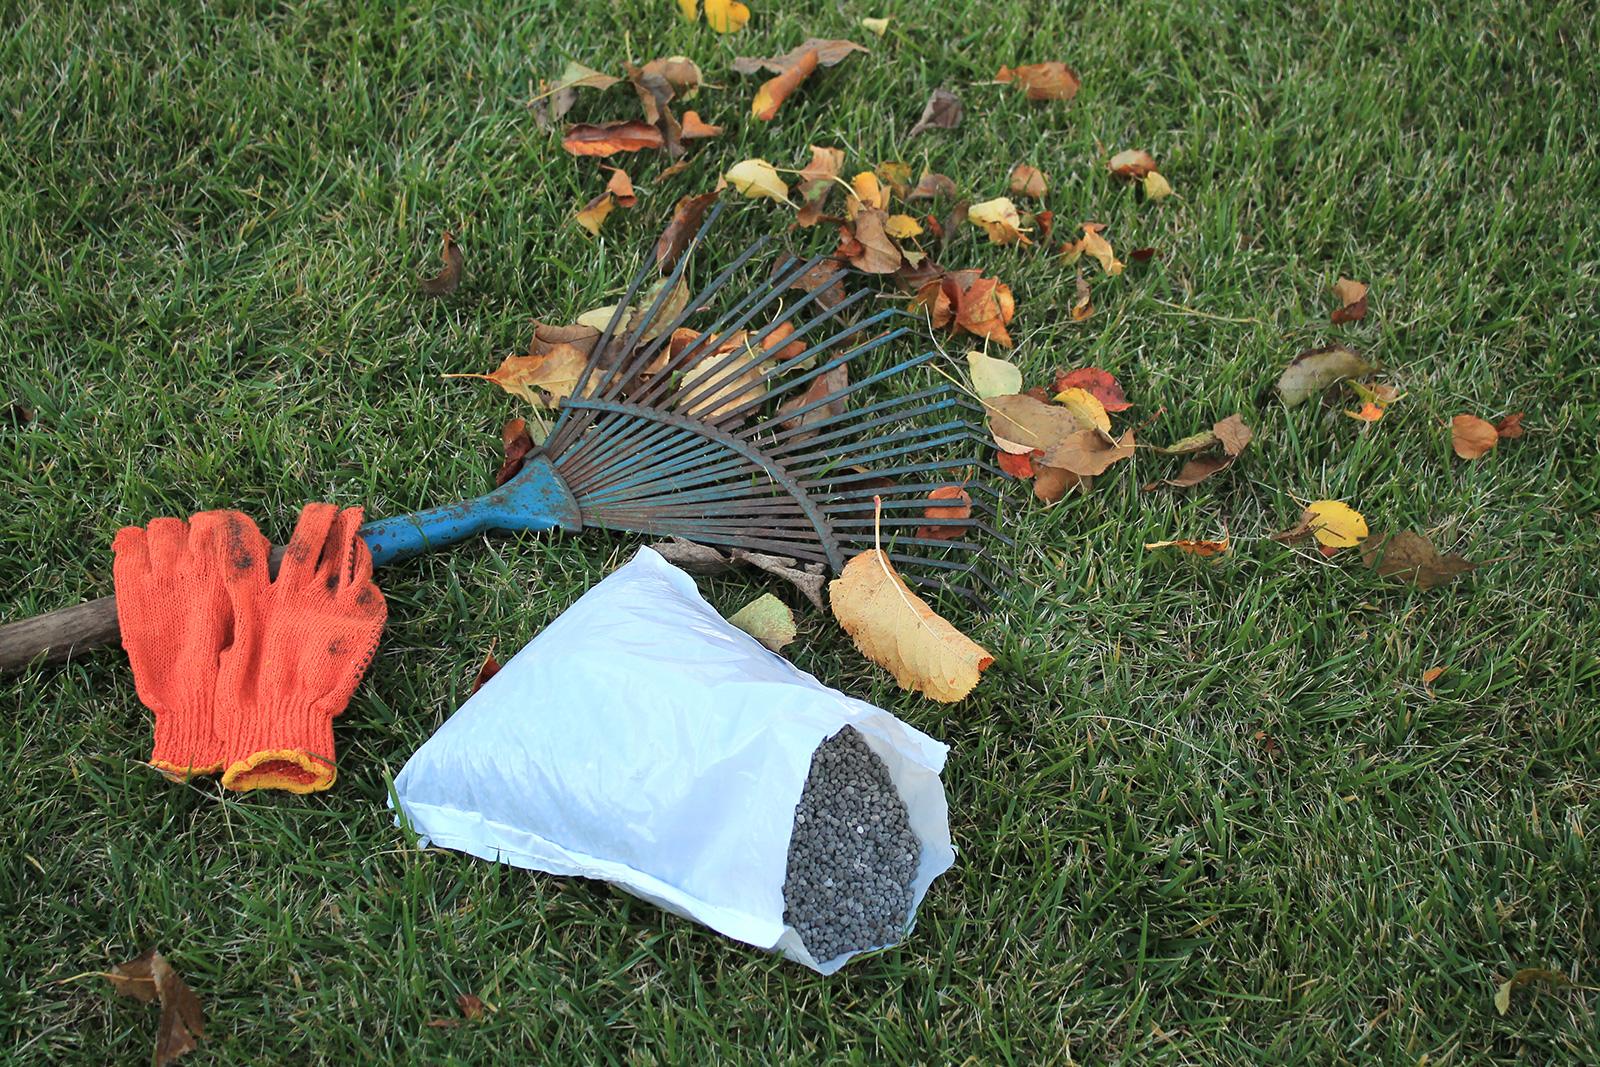 Rake, fall leaves and fertilizer bag